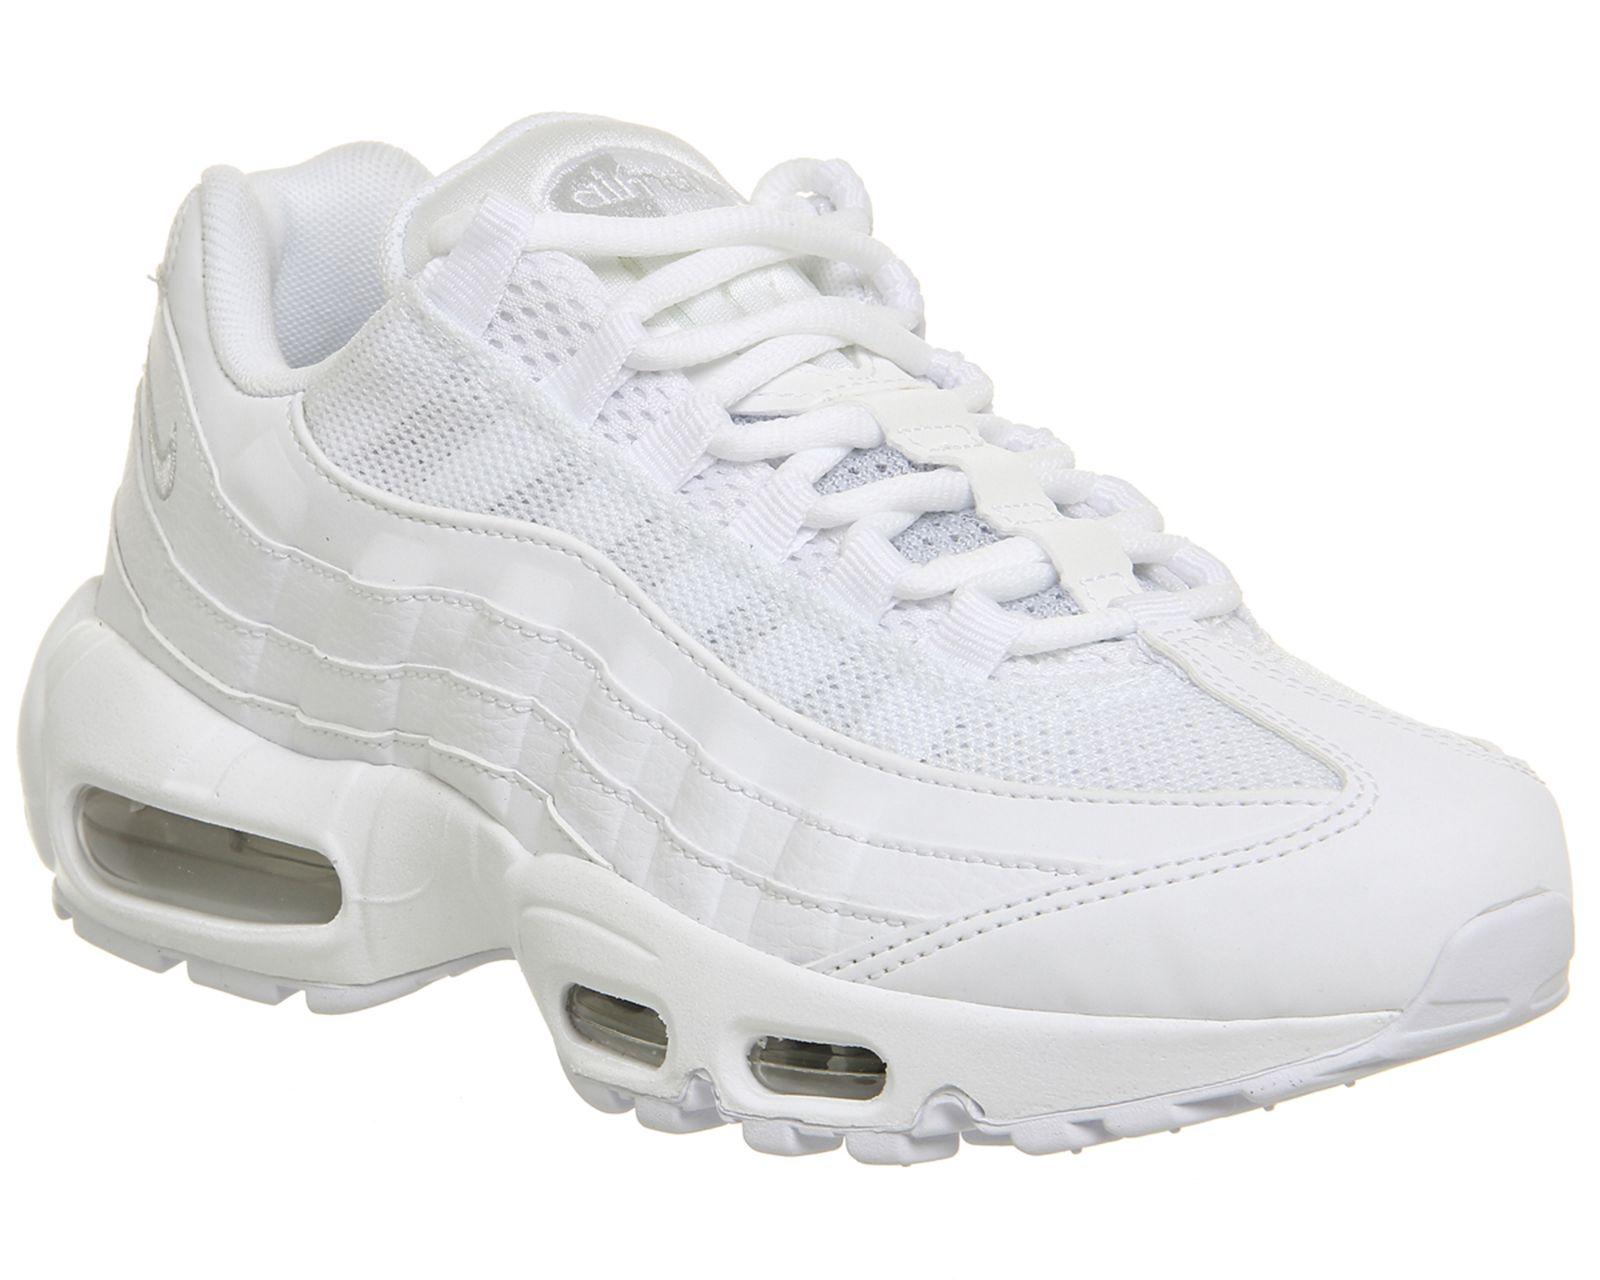 huge discount 74747 1545d Nike, Air Max 95, White Pure Platinum